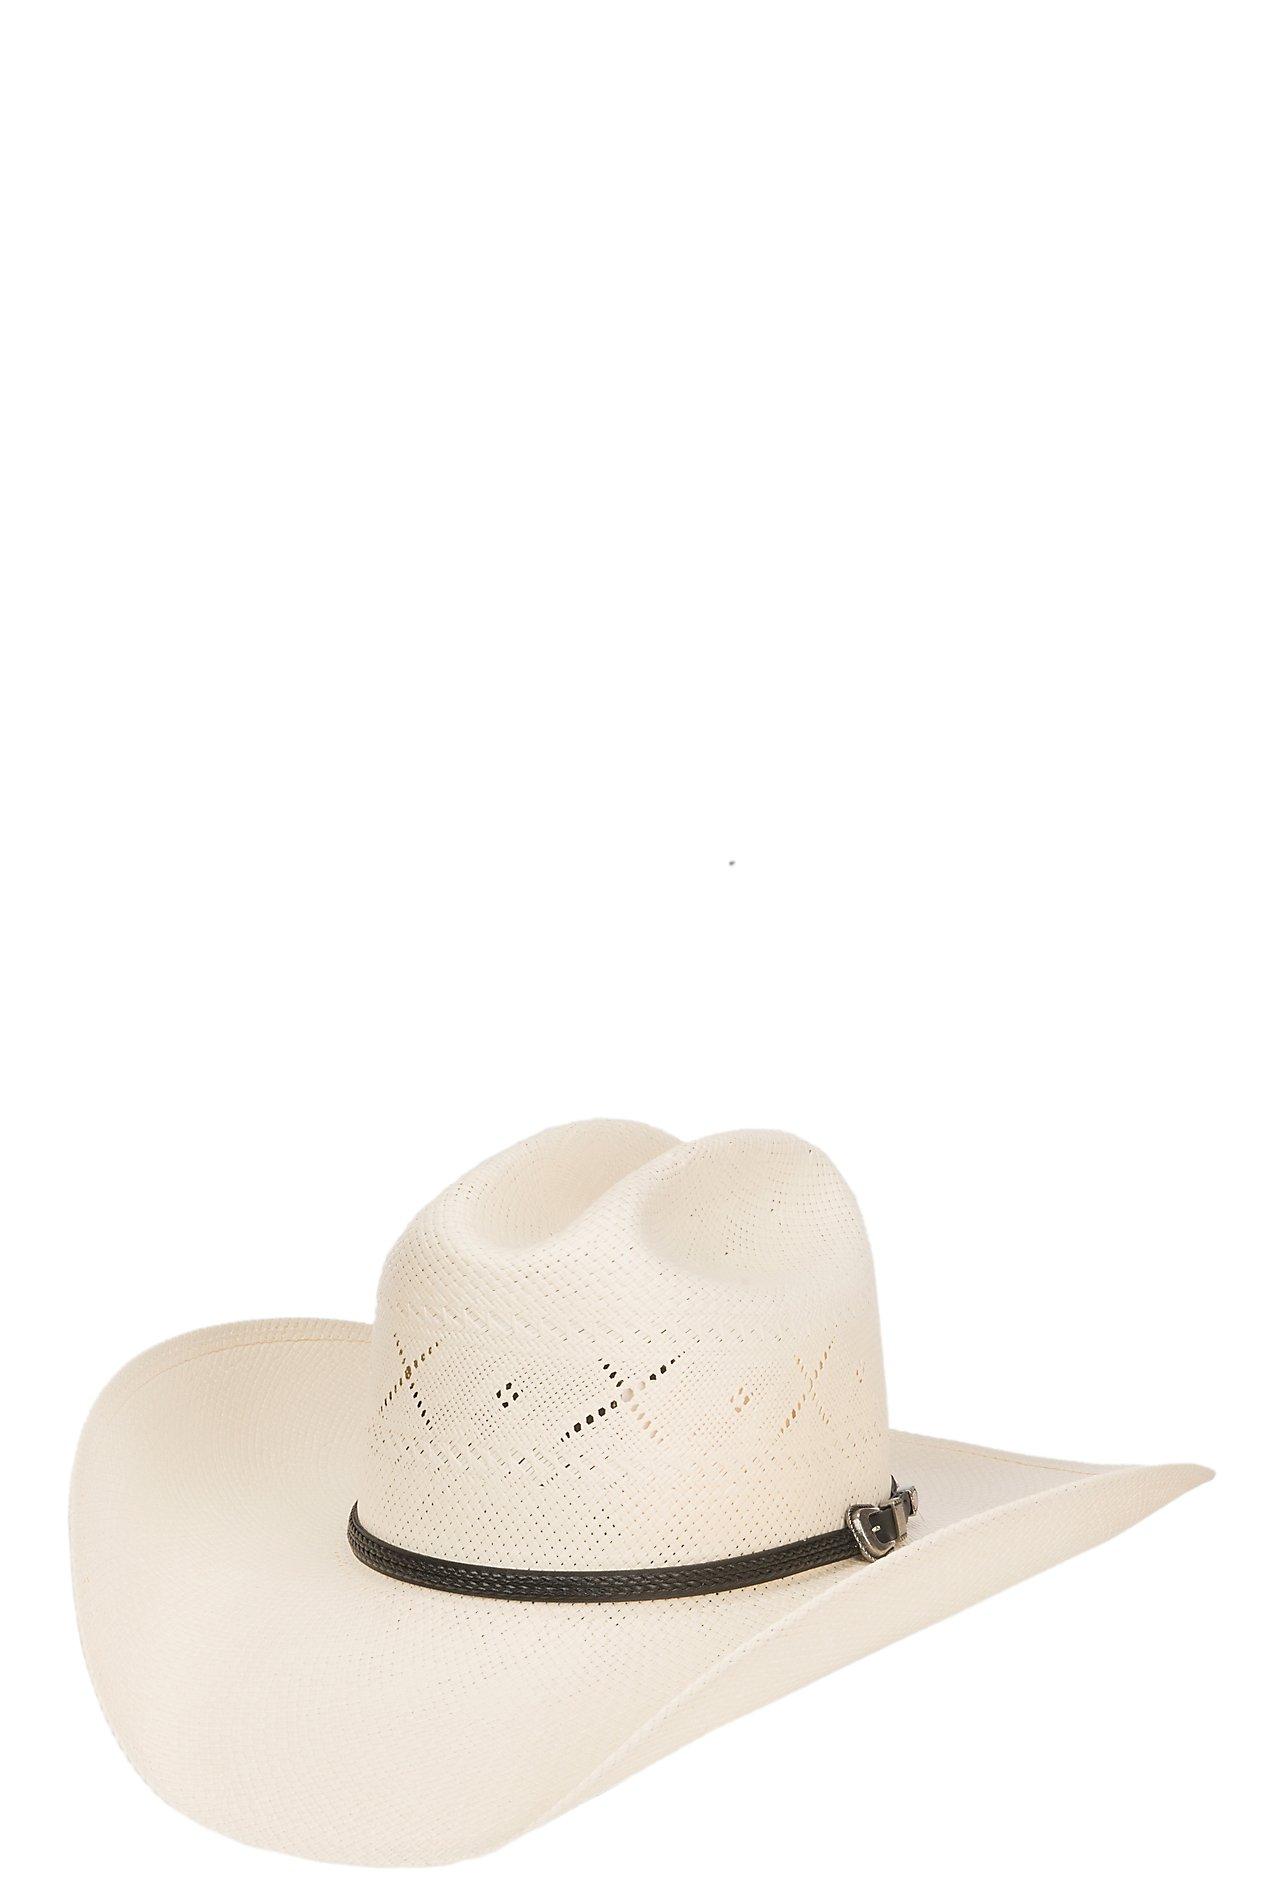 3d1f08651bd Resistol 20X George Strait All My Exes Straw Cowboy Hat